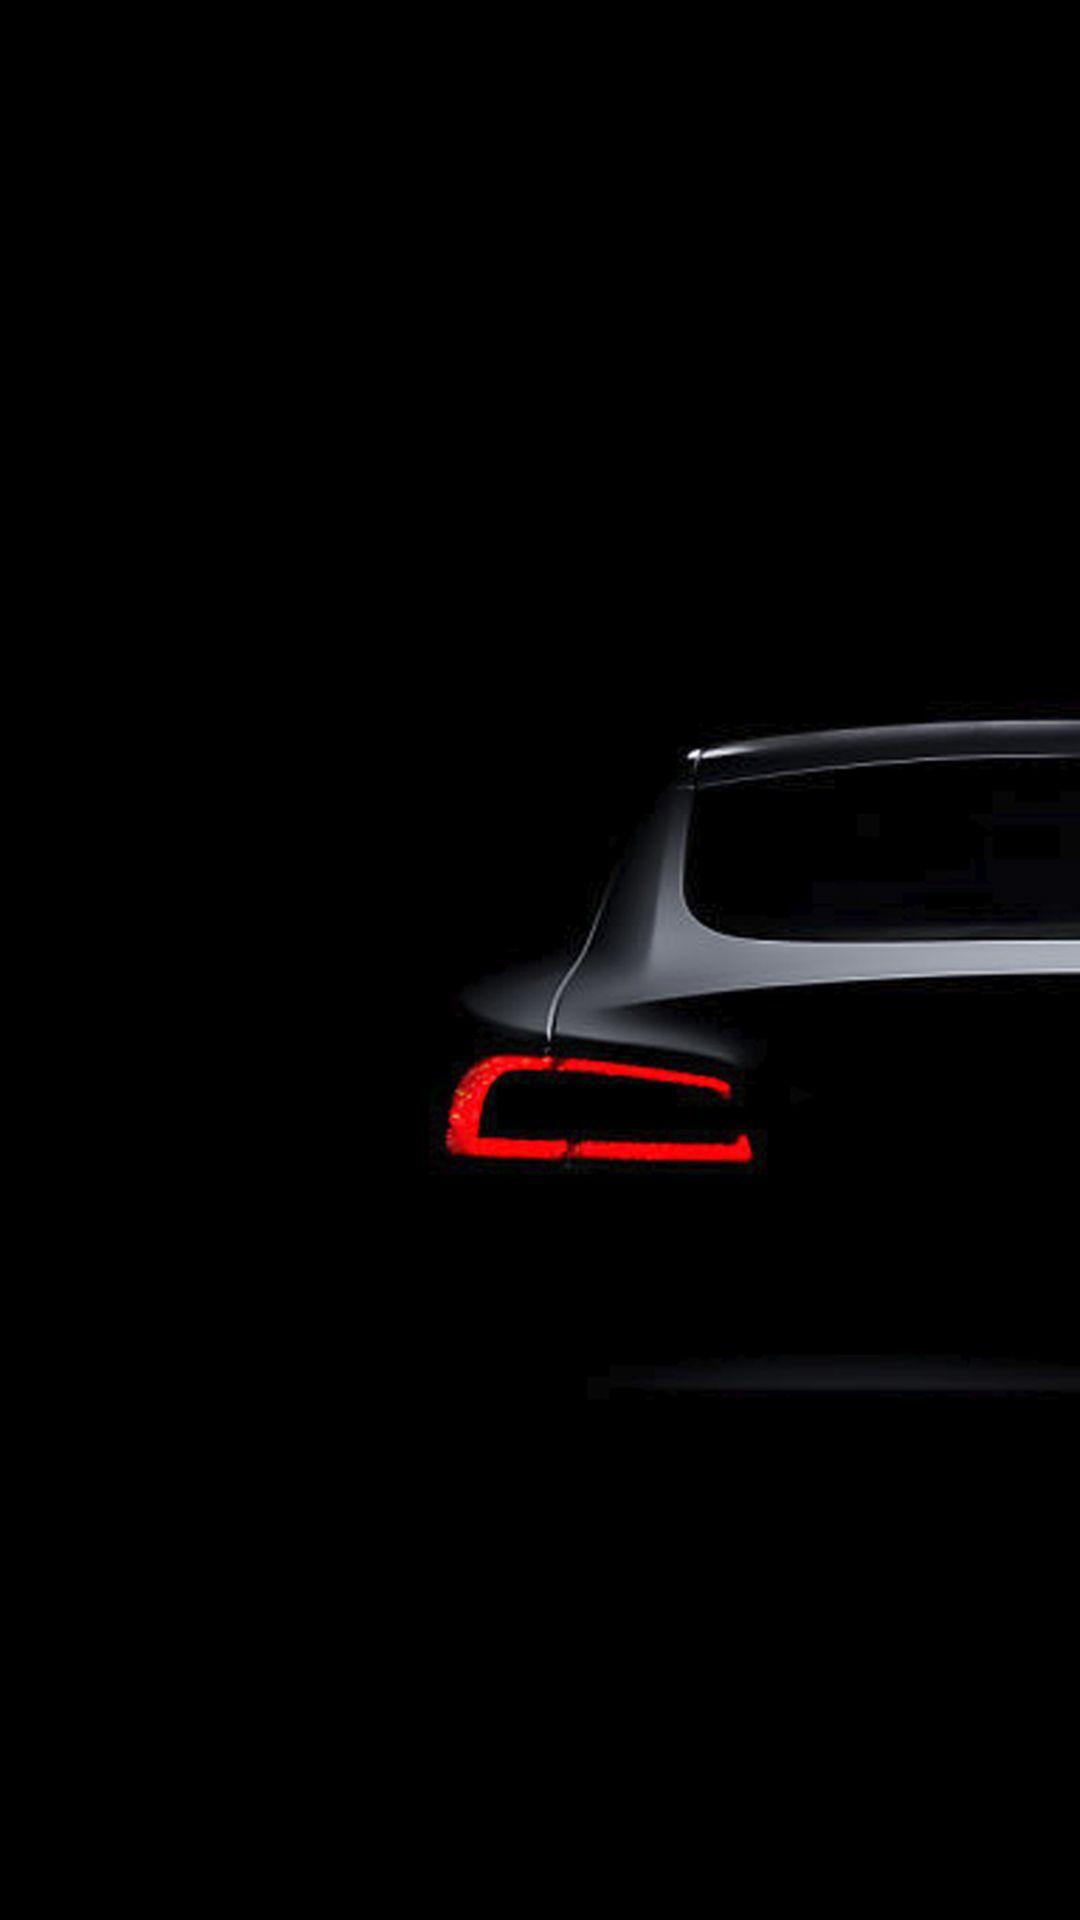 Tesla Model S Dark Brake Light iPhone 6 HD Wallpaper Dark 1080x1920